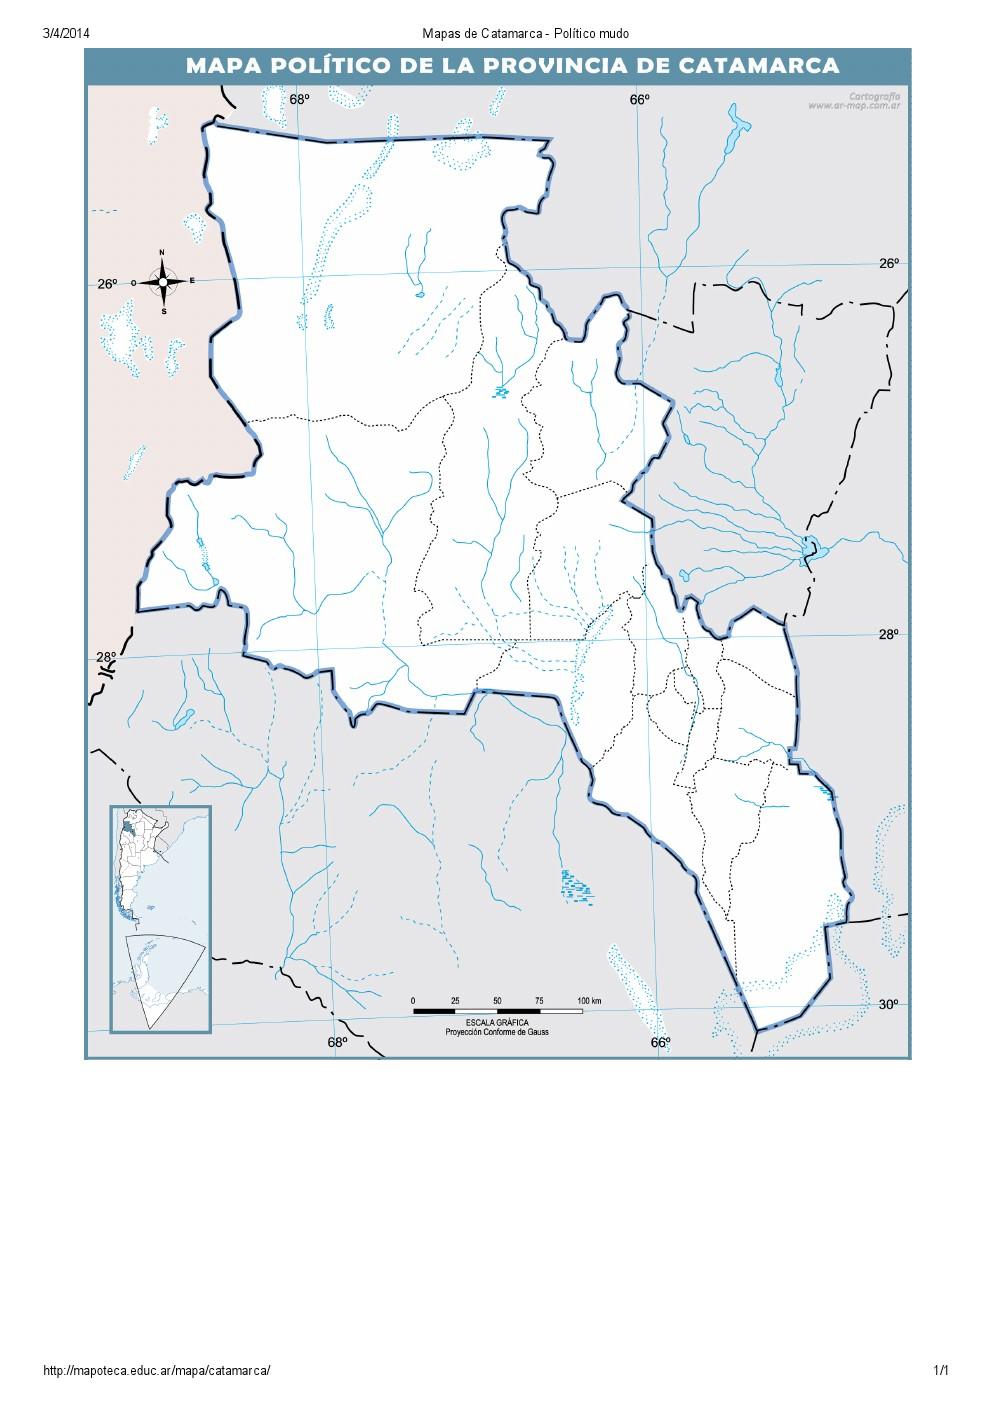 Mapa mudo de capitales de Catamarca. Mapoteca de Educ.ar